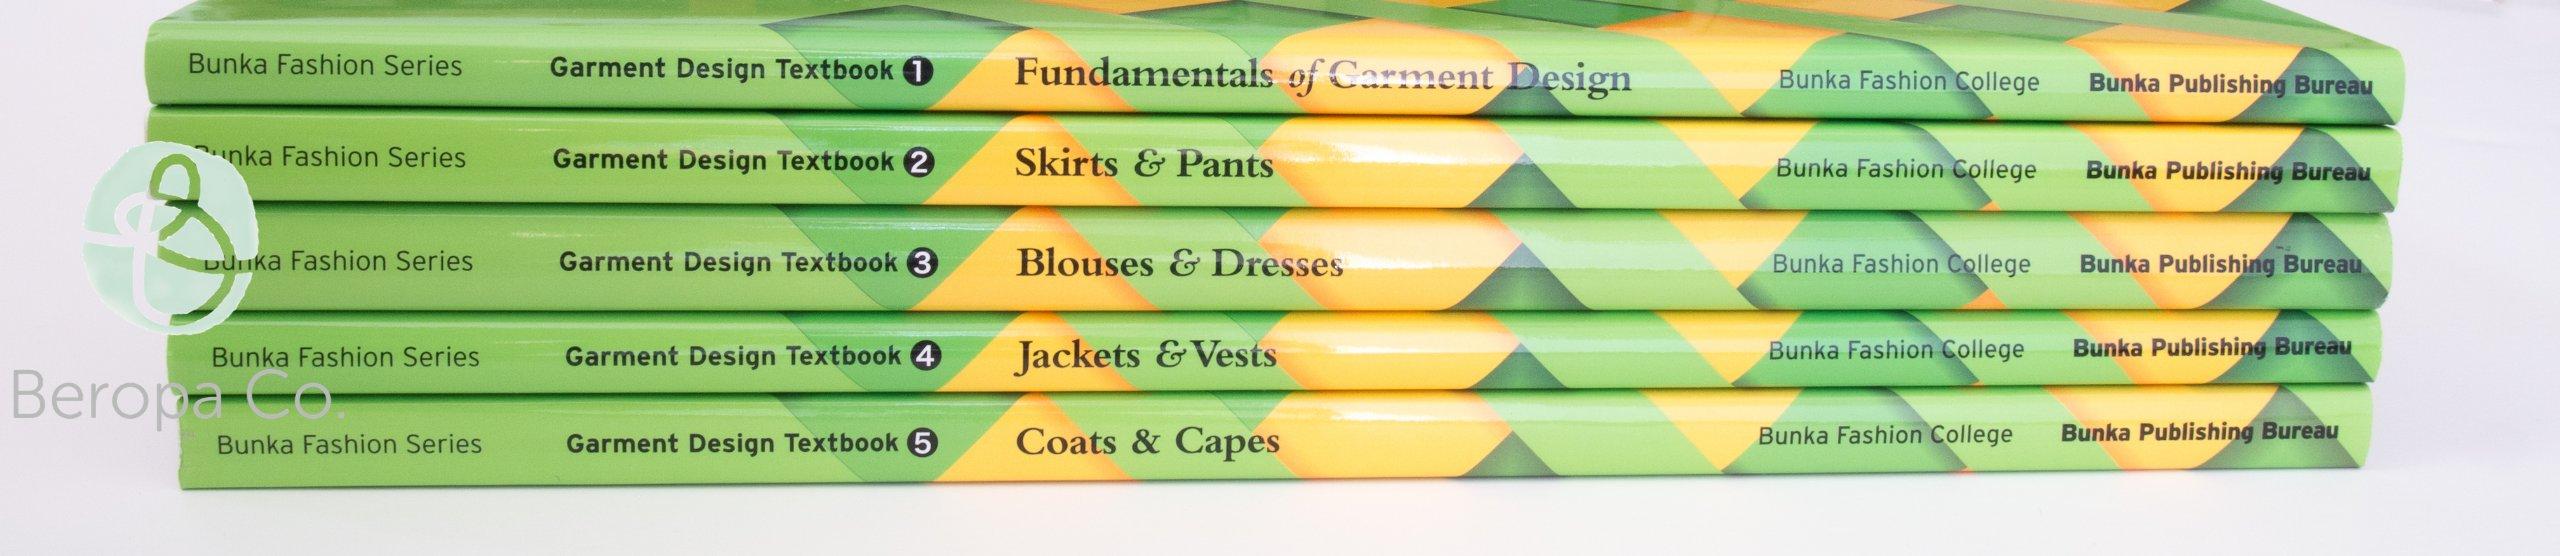 Bunka Fashion Series Garment Design Textbook 5 Coats Capes Bunka Publishing Bureau Bunka Fashion College Sunao Onuma Dr Satoshi Onuma 9784579112807 Amazon Com Books